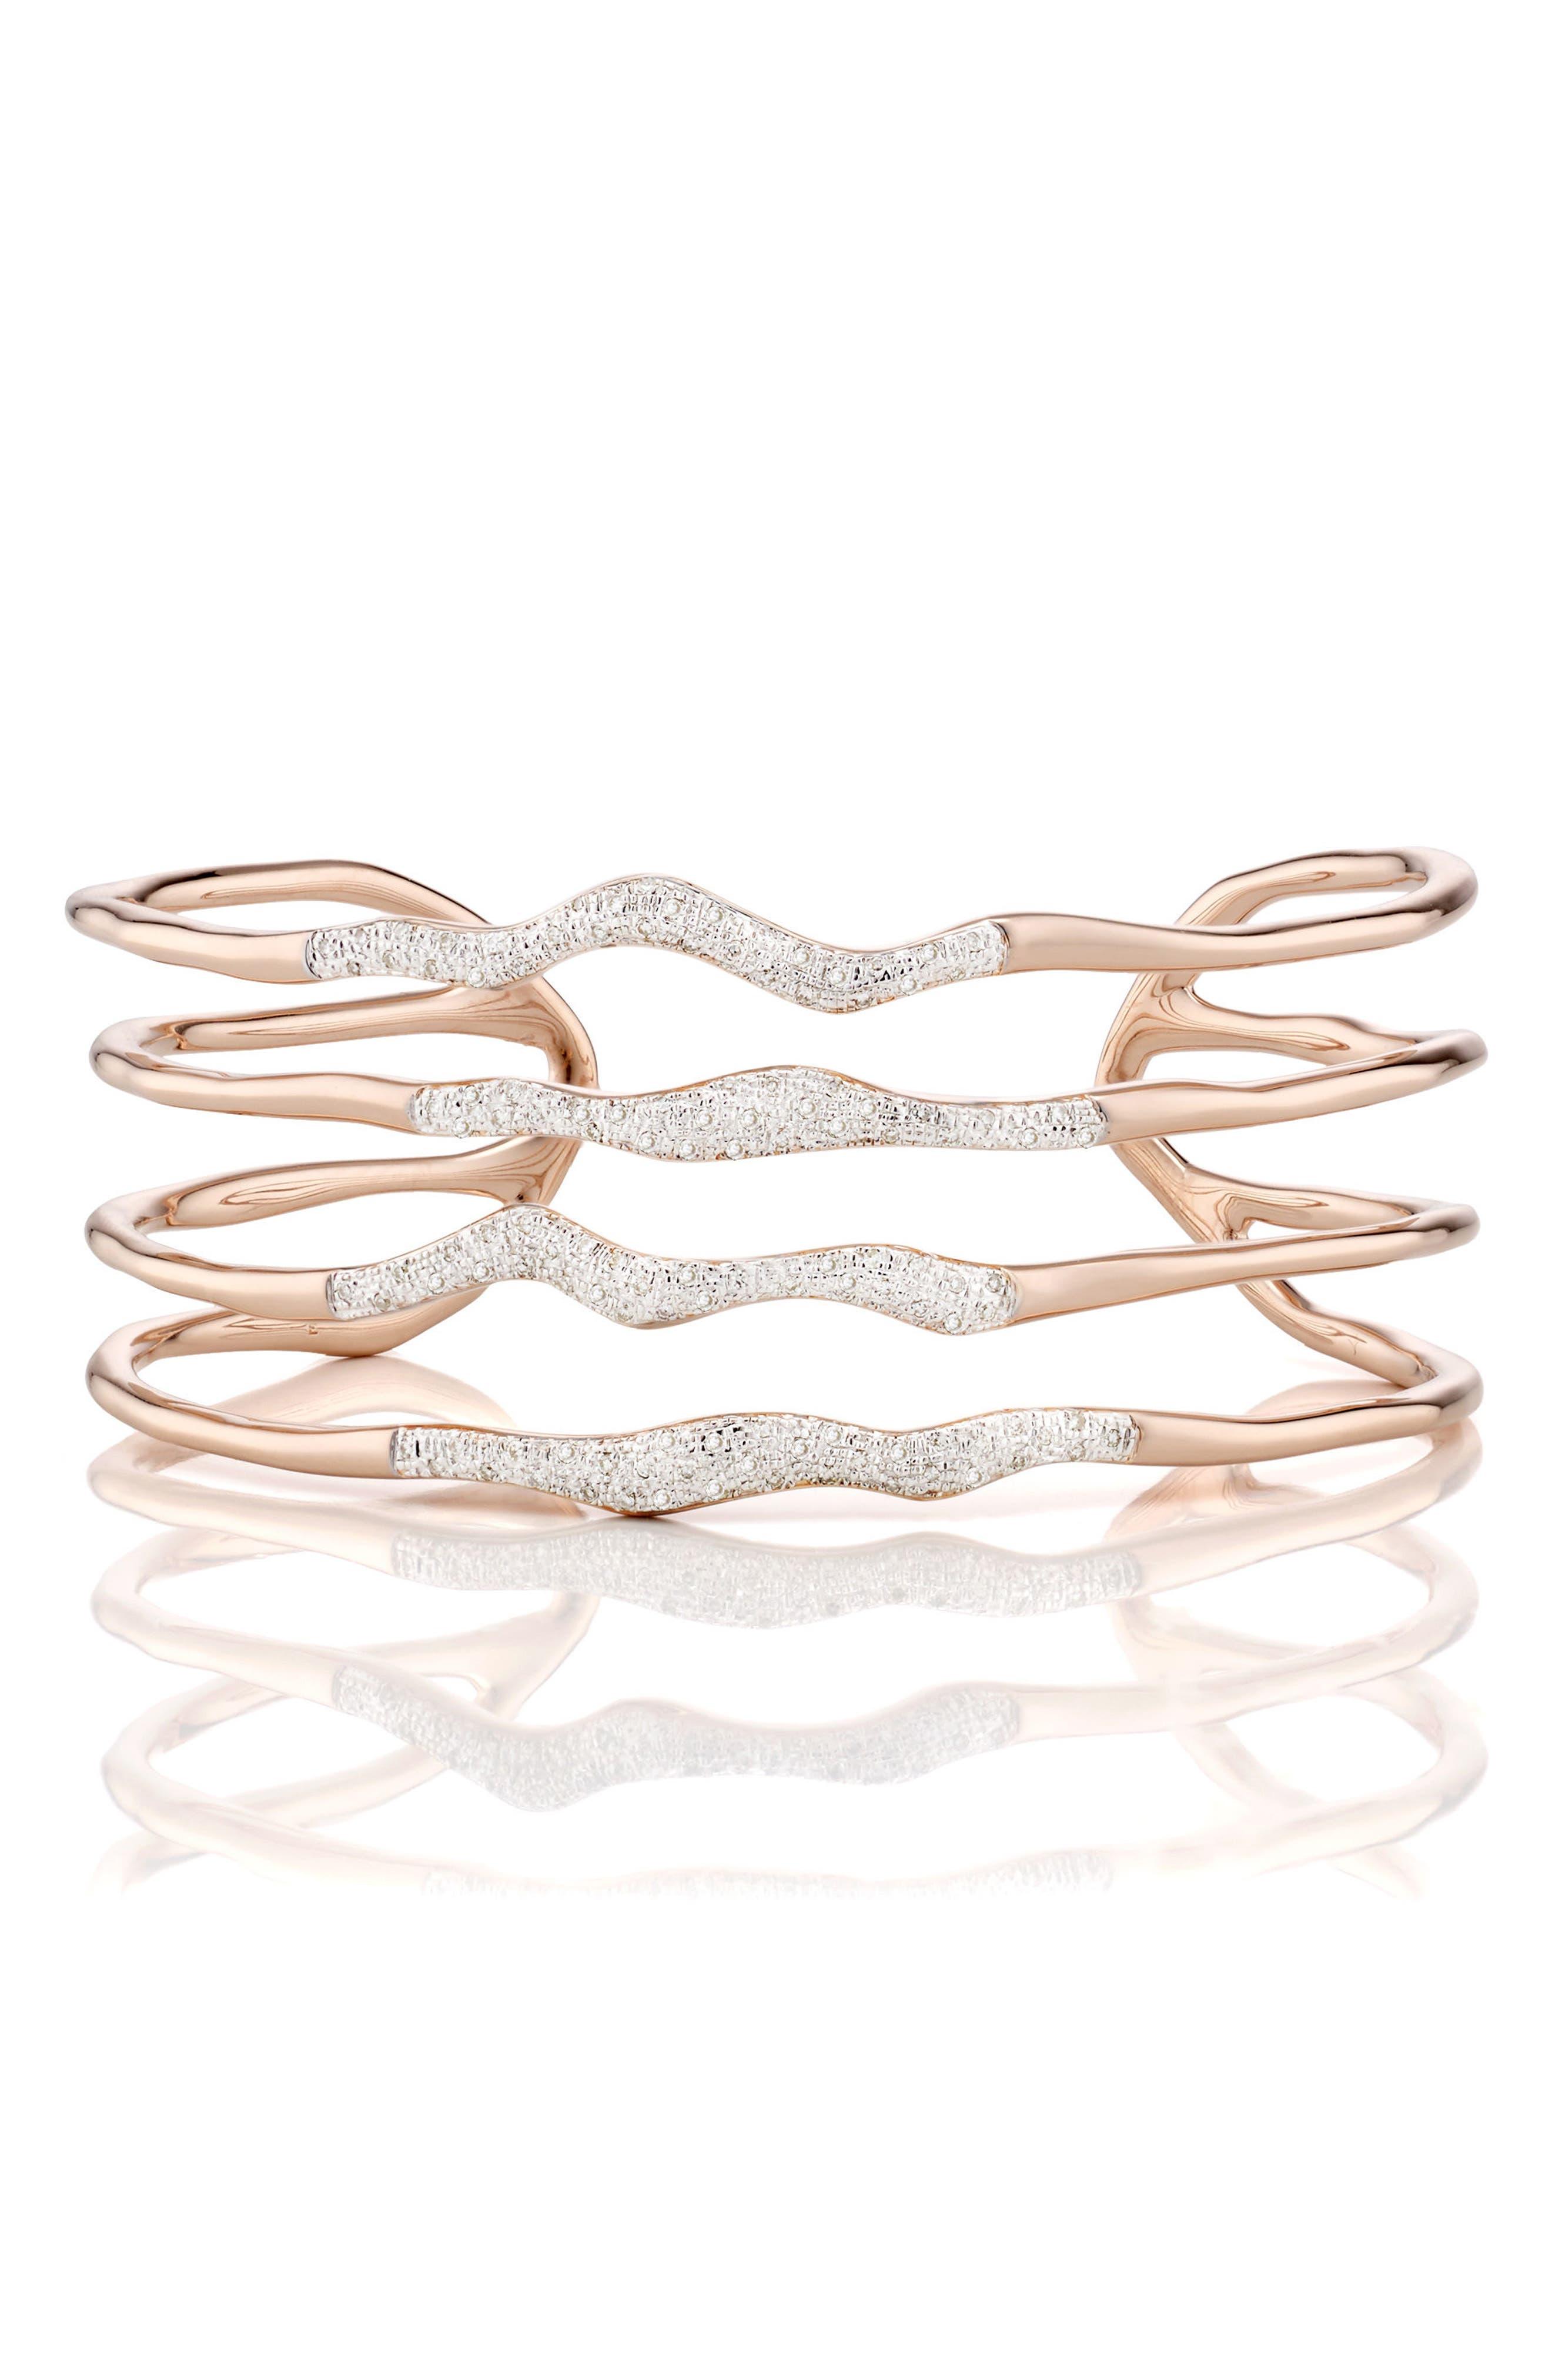 Riva Diamond Hero Wave Cuff Bracelet,                         Main,                         color, ROSE GOLD/ DIAMOND